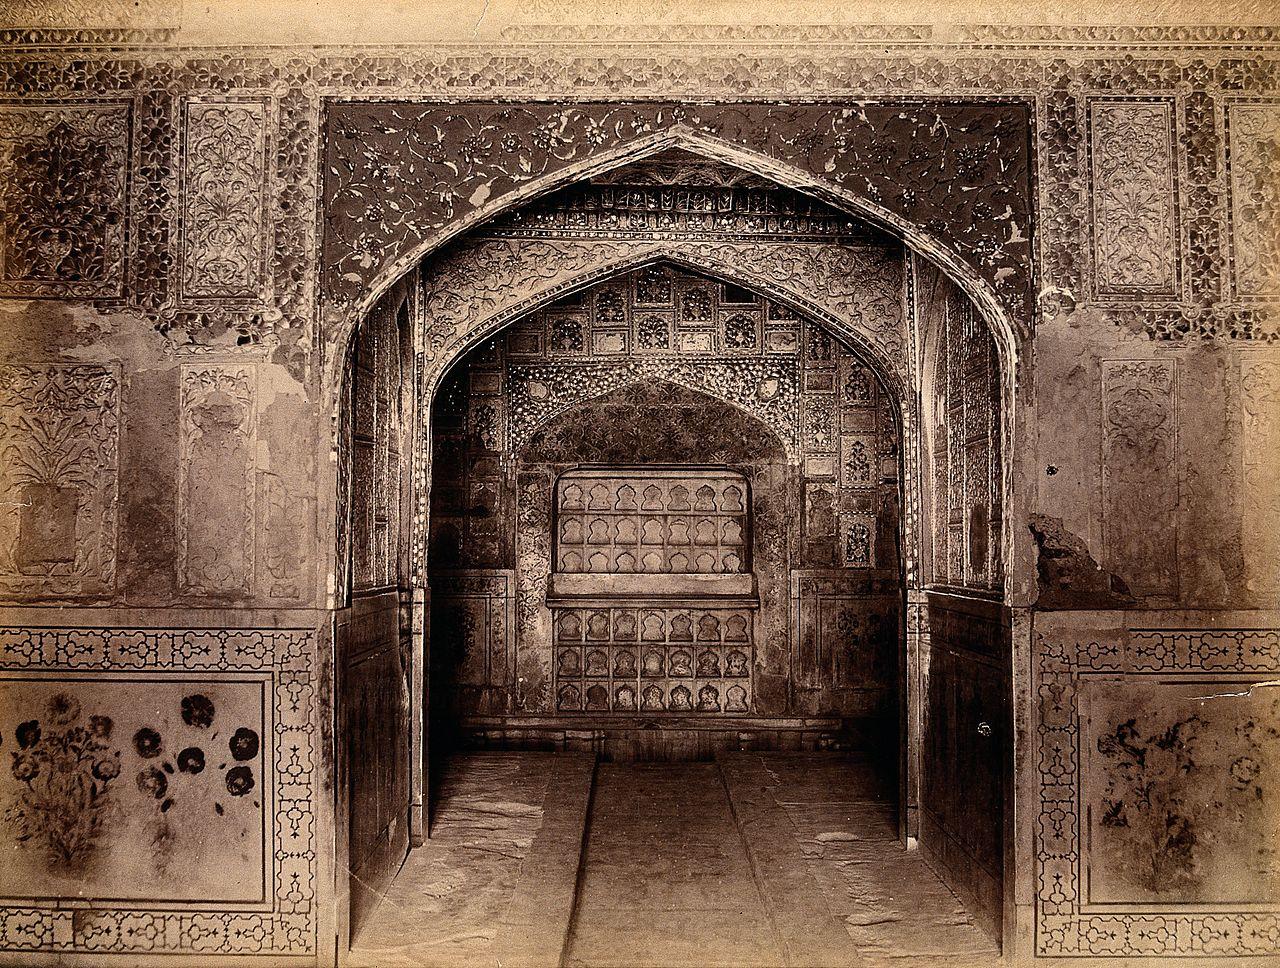 File interior of the taj mahal india wellcome v0037719 for Interior taj mahal